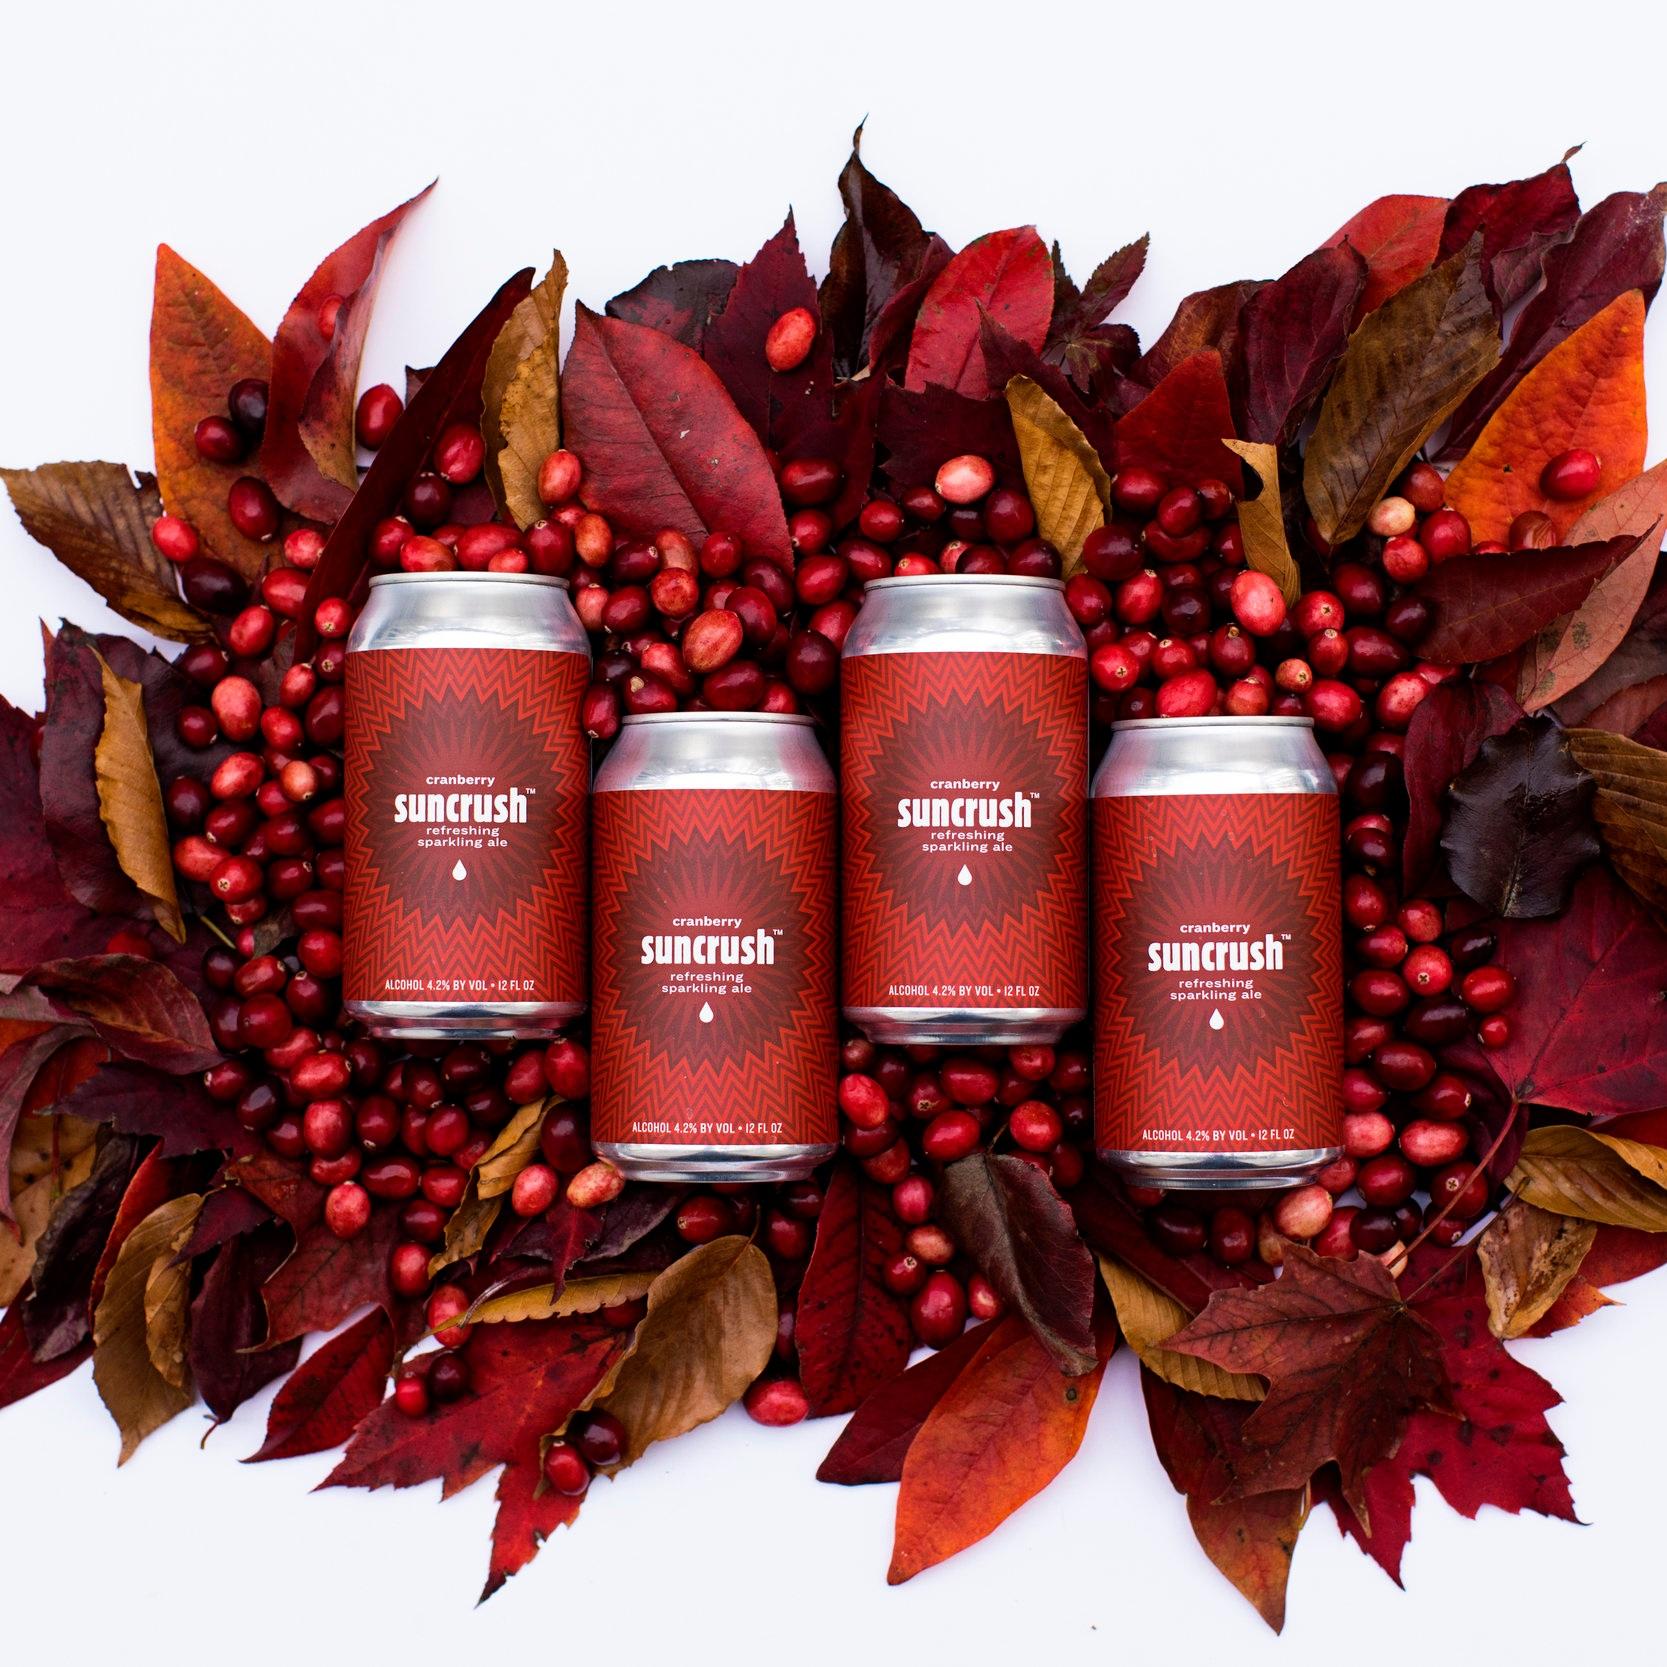 Cranberry+Suncrush+Cans.jpg